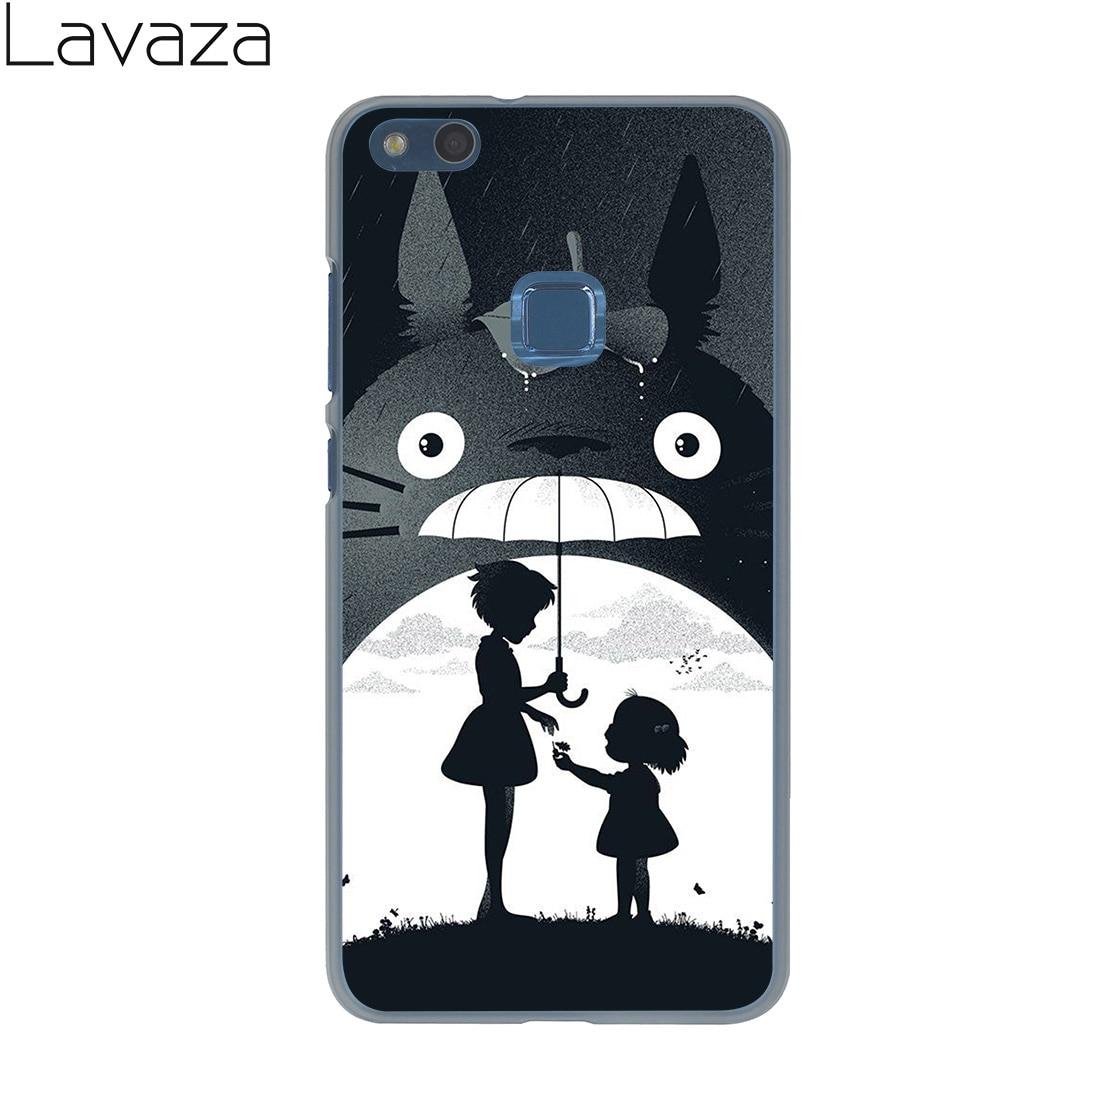 Lavaza My Neighbor Arriving Totoro Outing Case for Huawei P20 P10 P9 Plus P8 Lite Mini 2016 2017 P smart Mate 10 9 Pro Lite